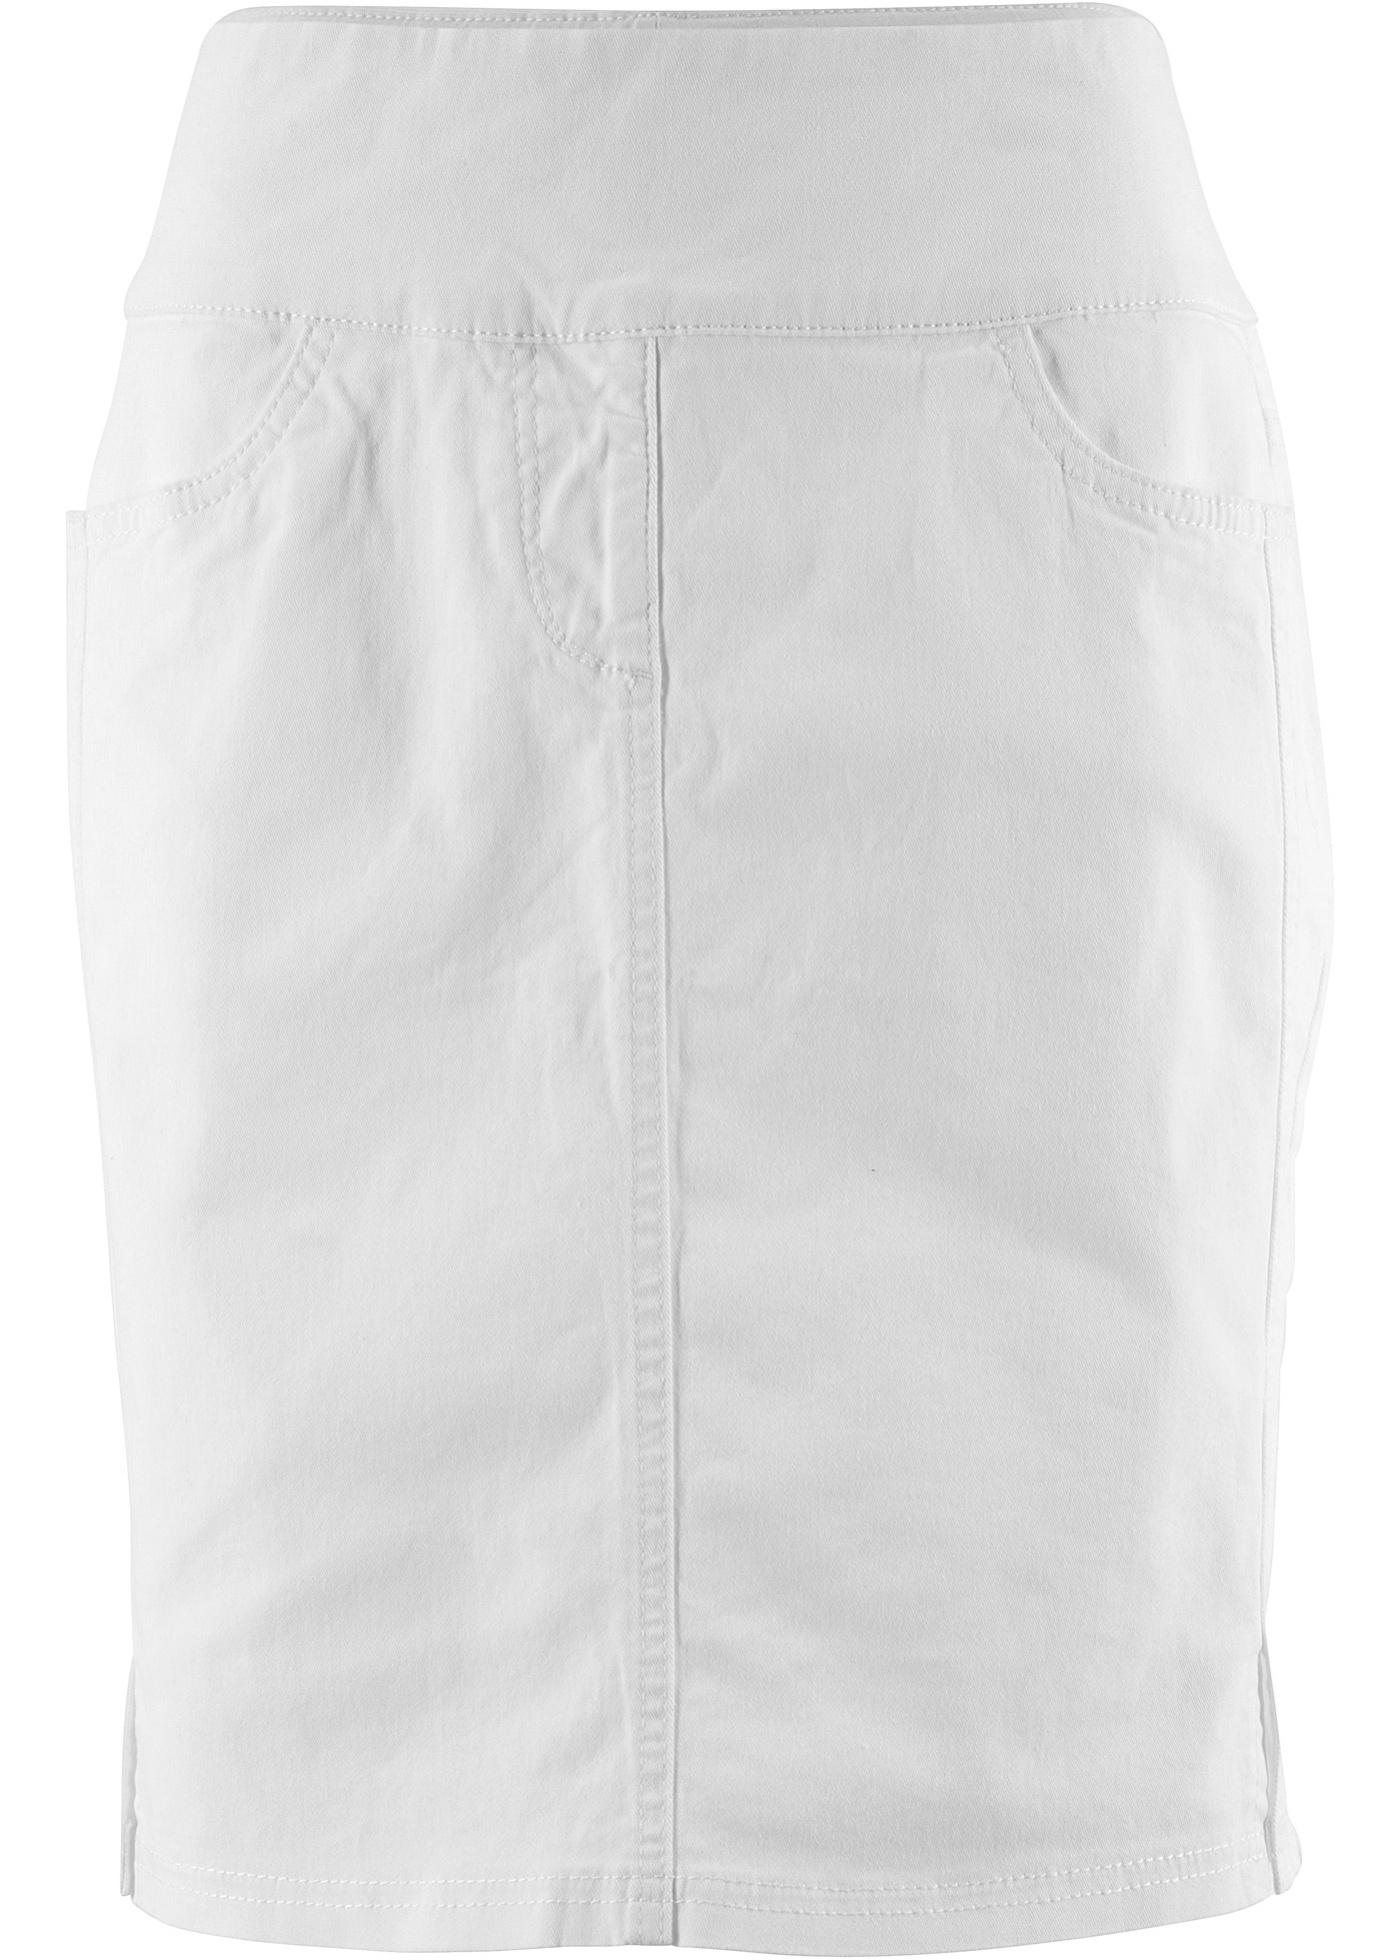 Strečová sukně s vysokým pasem - Bílá 19e66df9f1